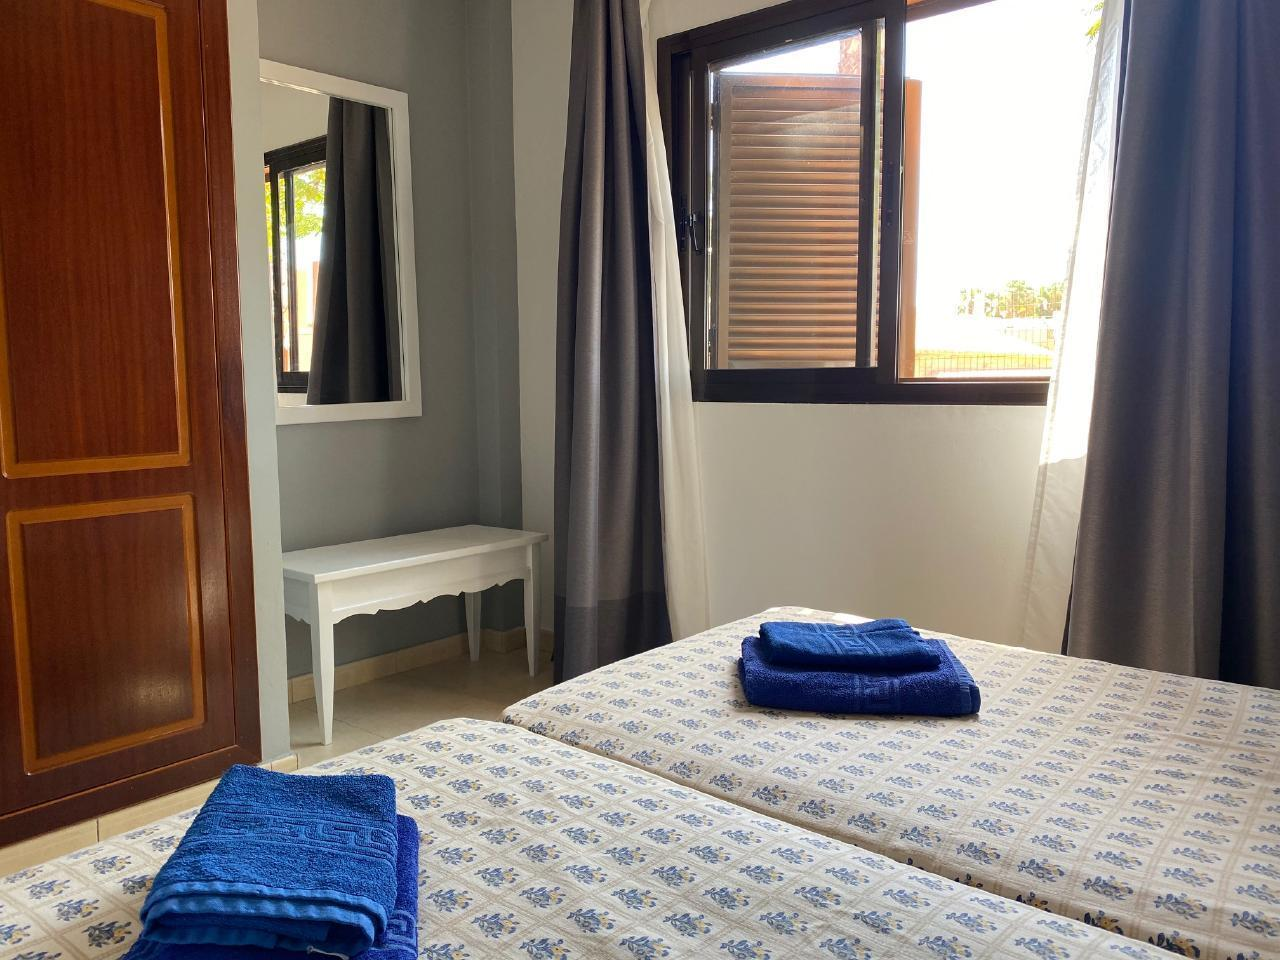 Ferienwohnung Apartments RO Corralejo (II) (431498), Corralejo, Fuerteventura, Kanarische Inseln, Spanien, Bild 31